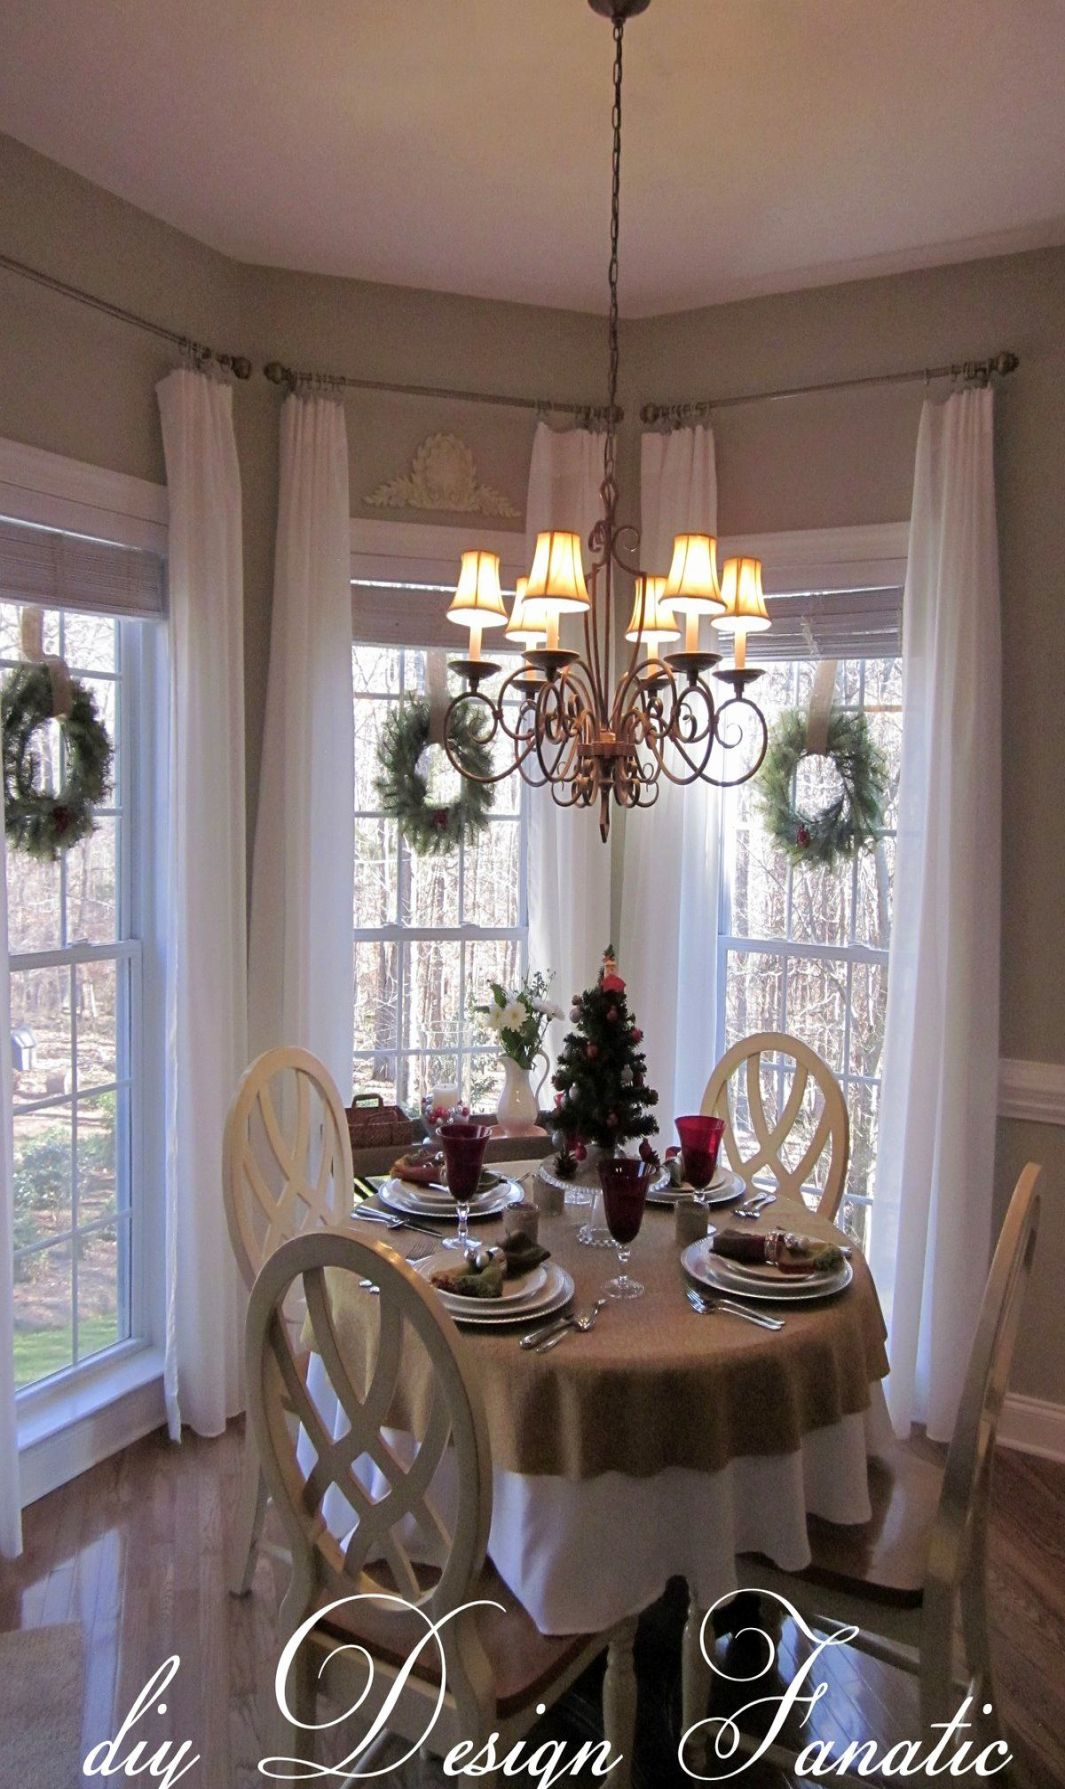 original farmhouse style window nook ideas merry christmas kitchen ideas bay window curtains in on farmhouse kitchen window id=48719